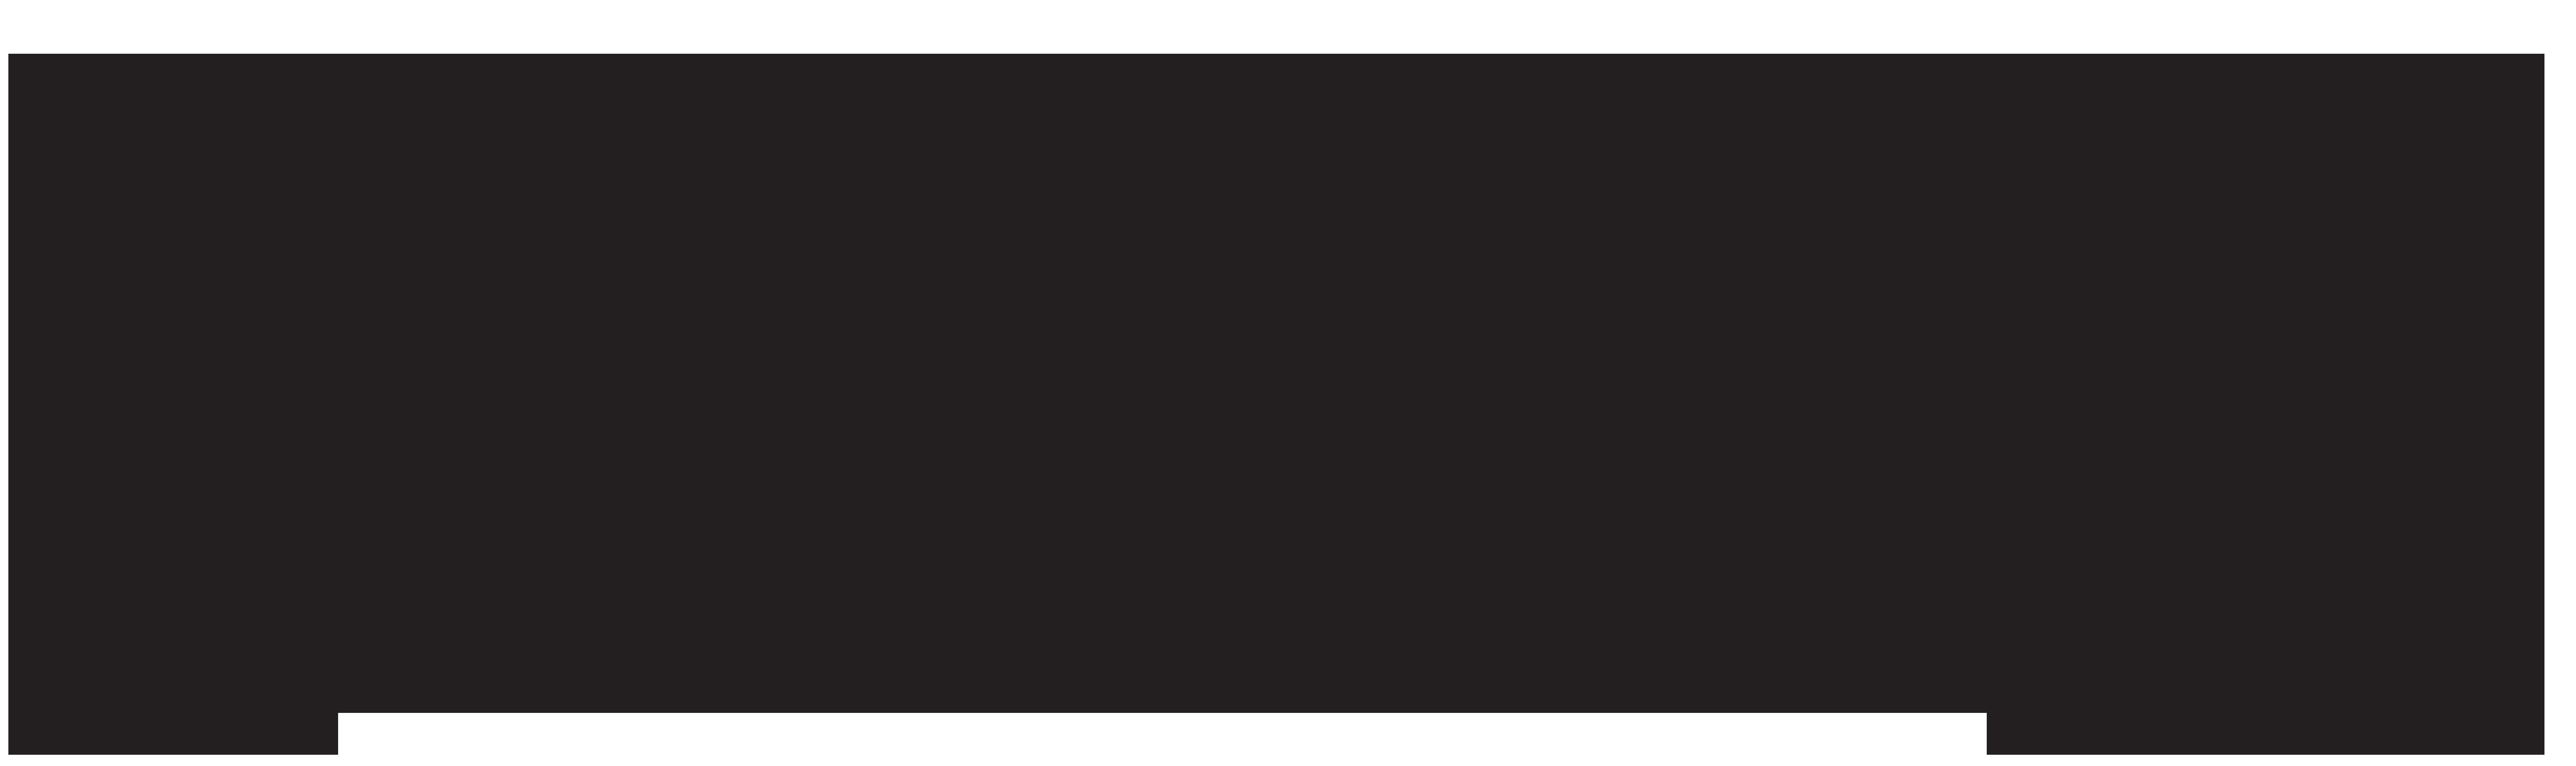 Camel caravan silhouette png. Camper clipart transparent background